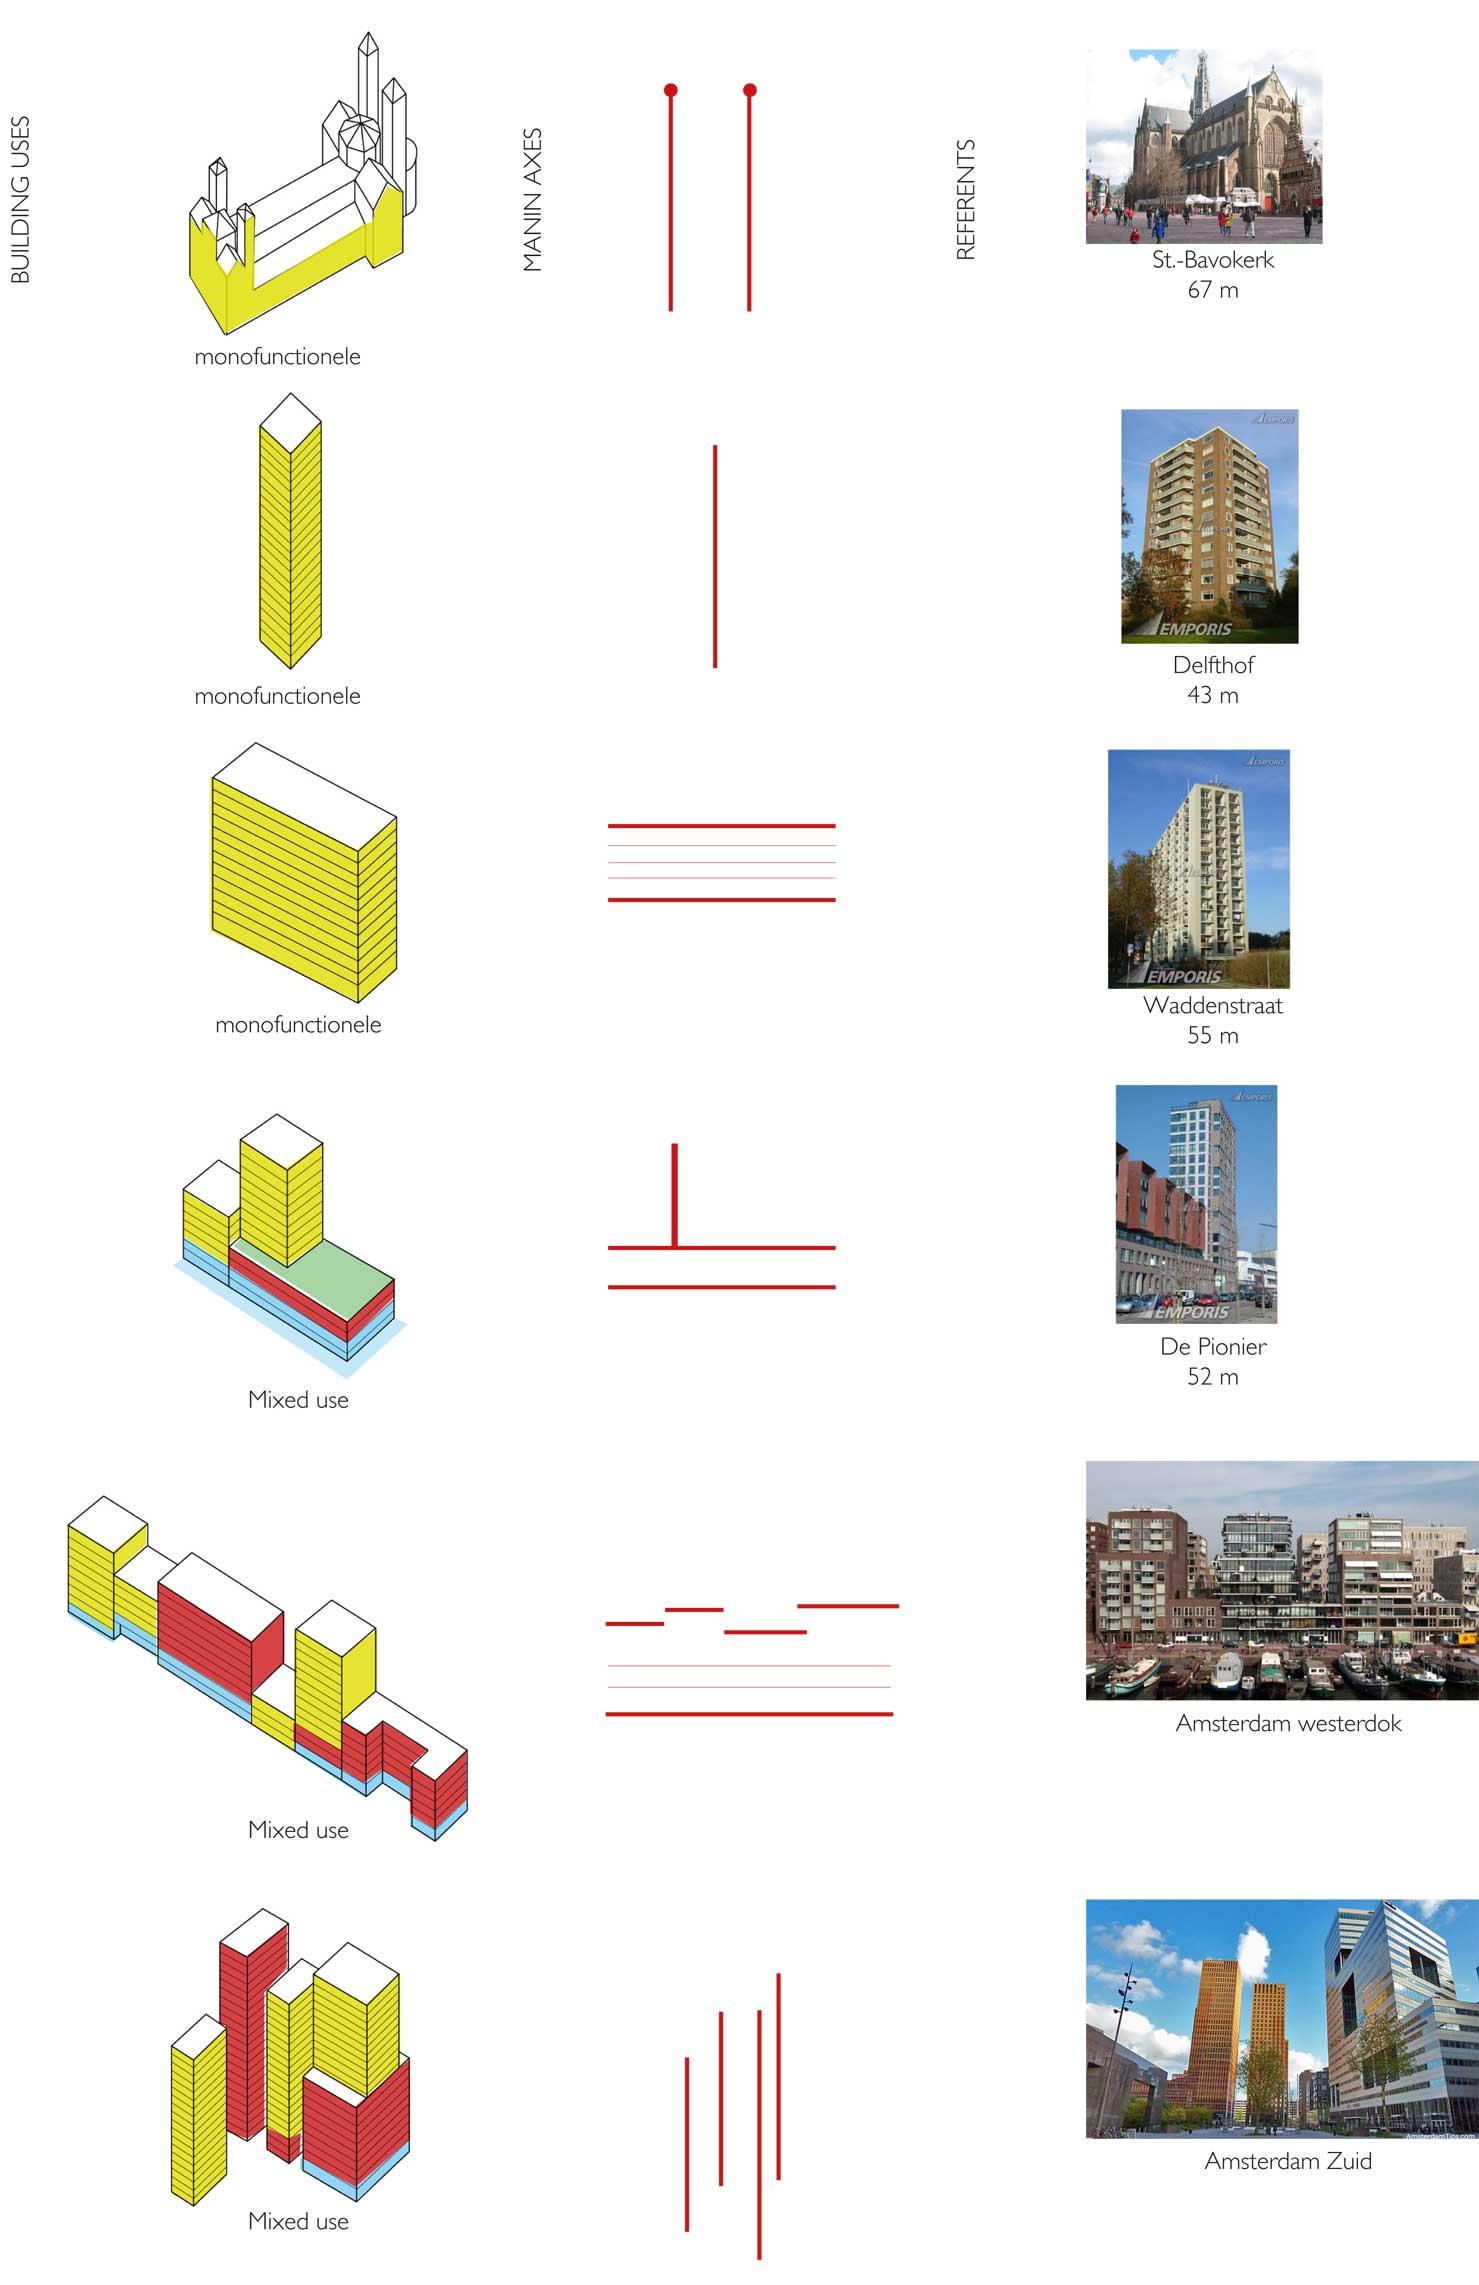 Hoogbouw typologie Haarlem